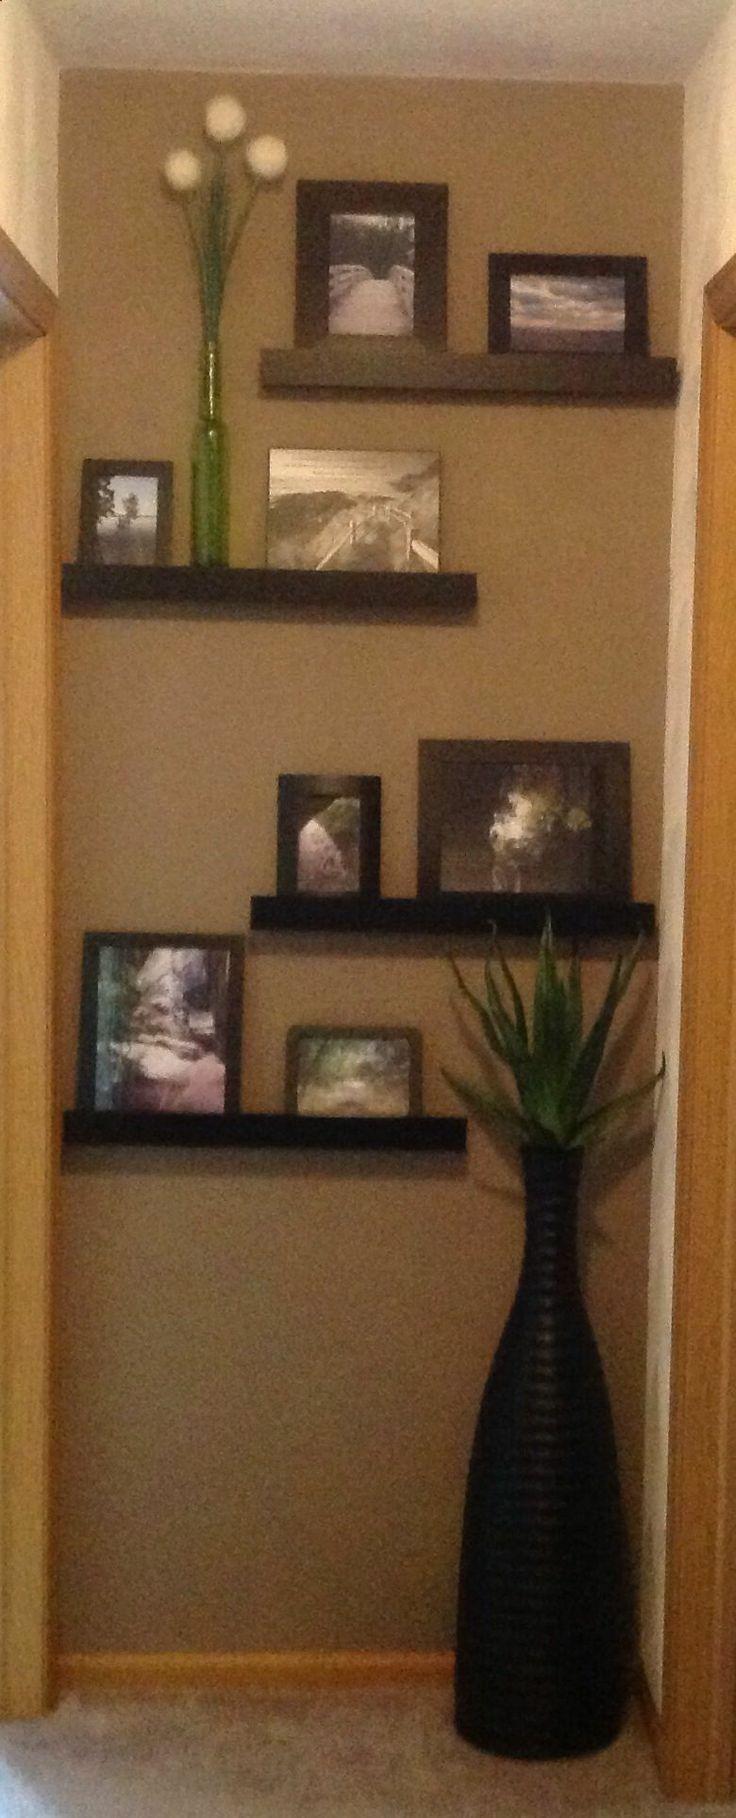 End of hallway photo display